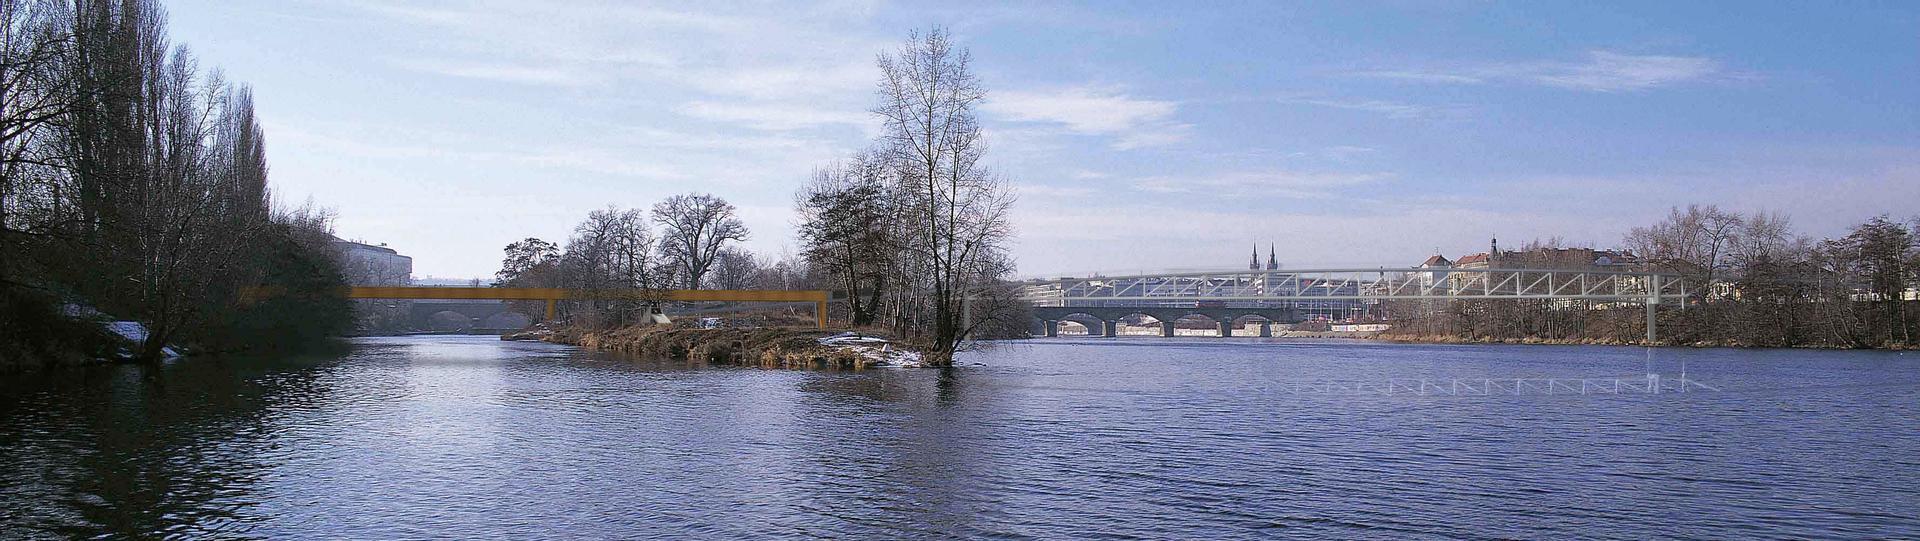 pedestrian bridge Holešovice-Karlín